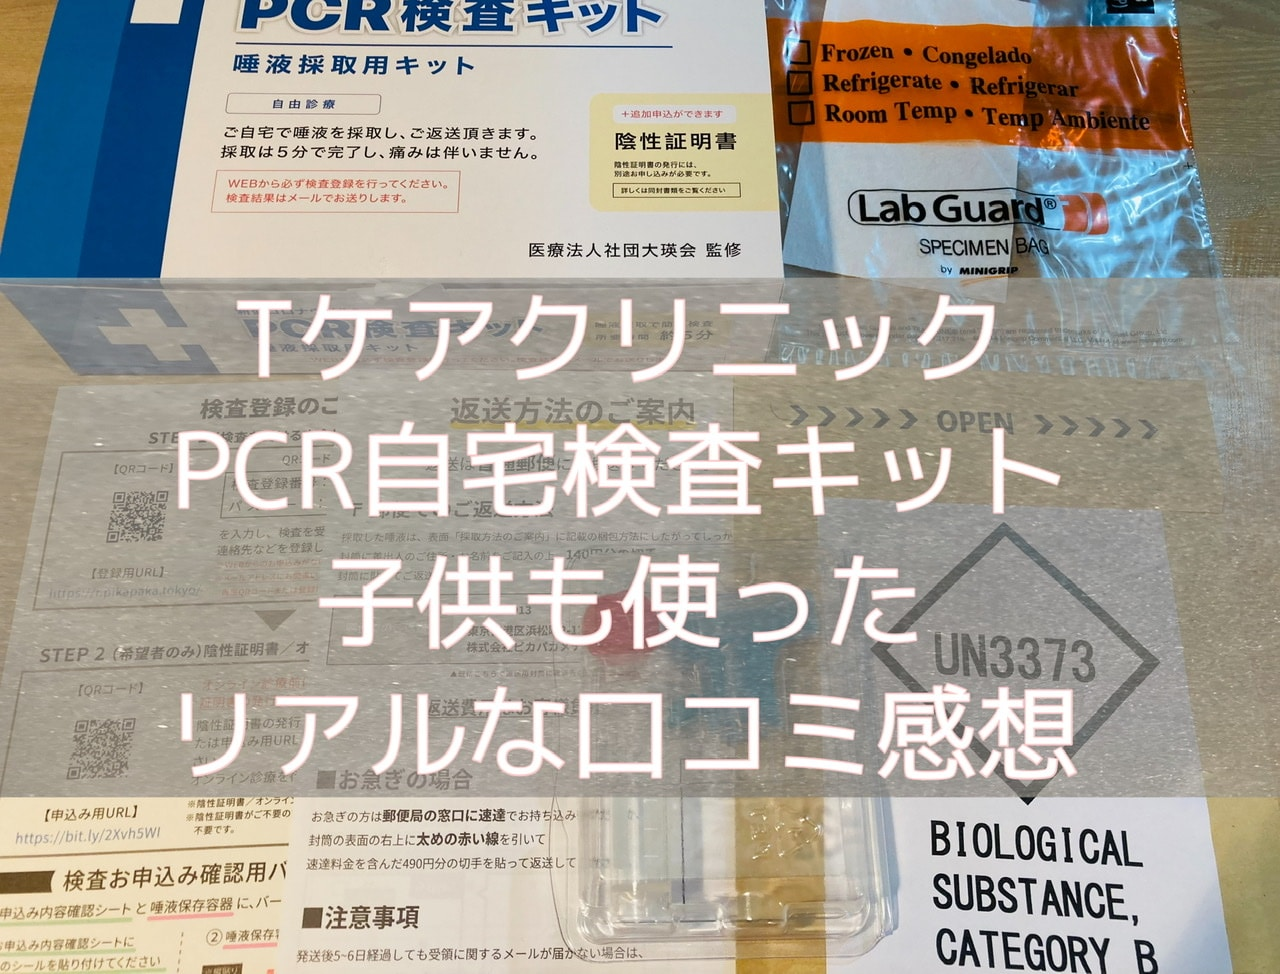 TケアクリニックPCR検査の自宅検査キットの口コミ感想!民間自費PCR,子供、領収証